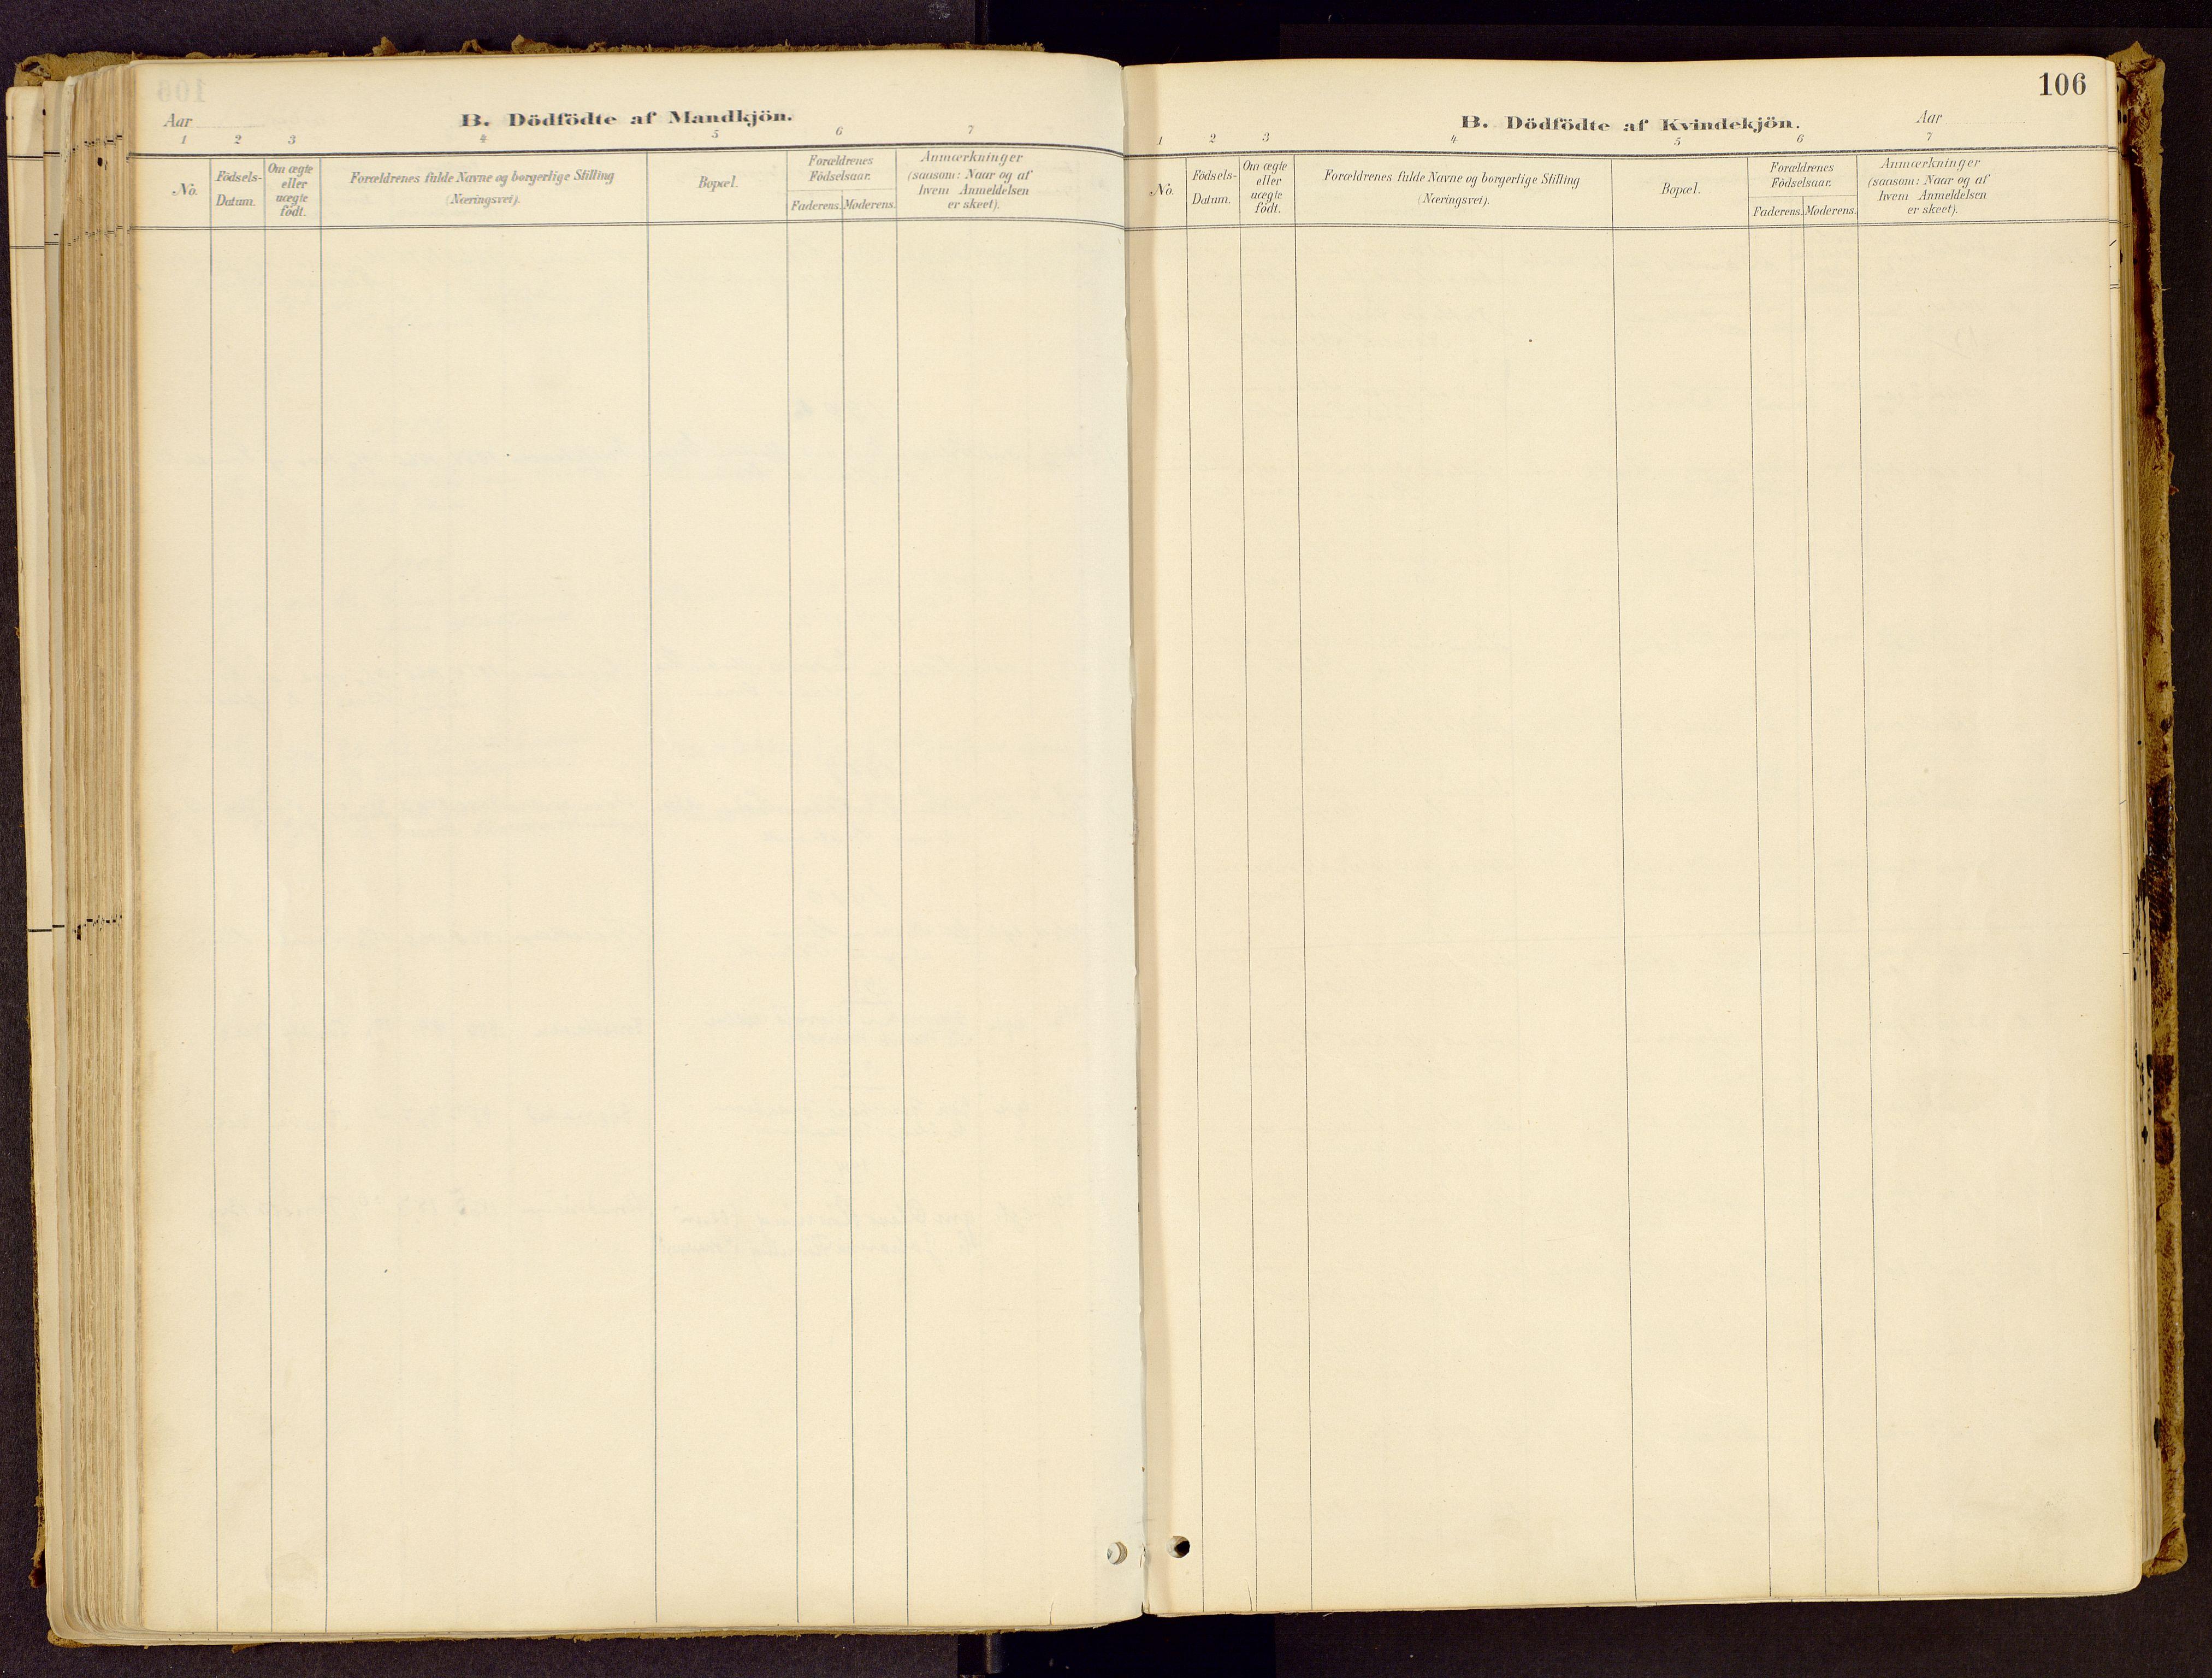 SAH, Vestre Gausdal prestekontor, Ministerialbok nr. 1, 1887-1914, s. 106